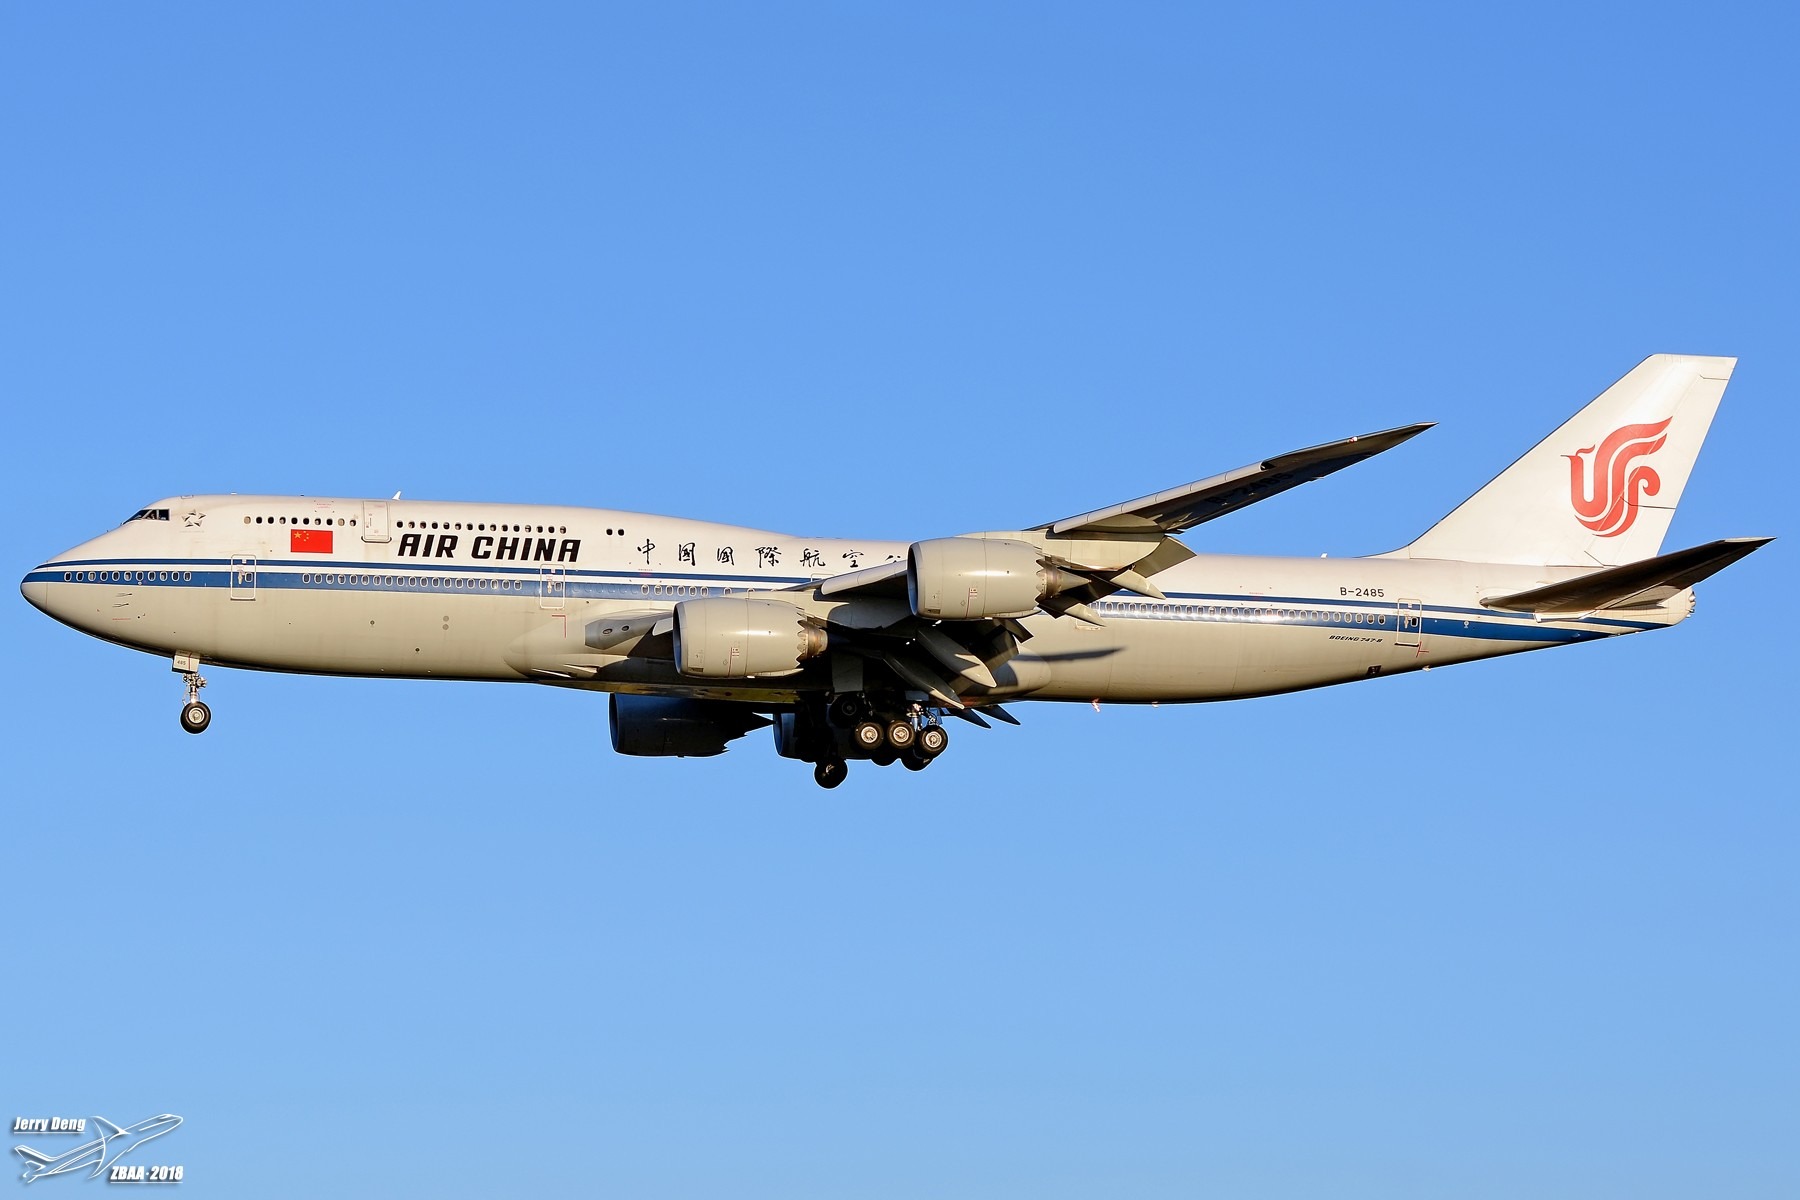 Re:[原创]【多图党】出差赶上天气不错ZBAA随拍 BOEING 747-8I B-2485 中国北京首都国际机场